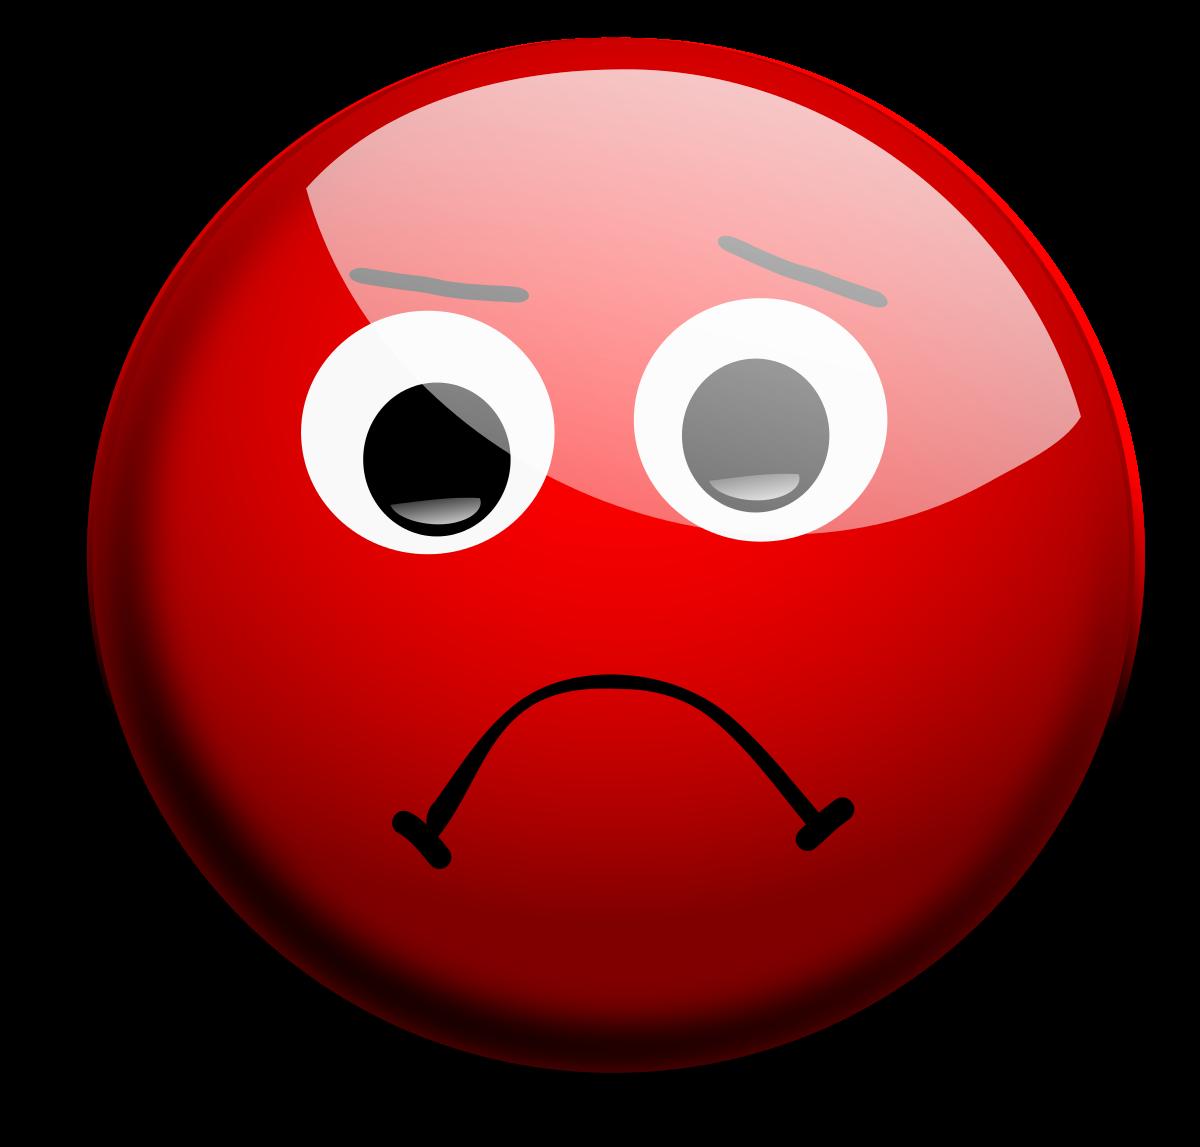 Sad face sad boy clipart free clipart images - Clipartix - Free Small Smiley Face Clip Art